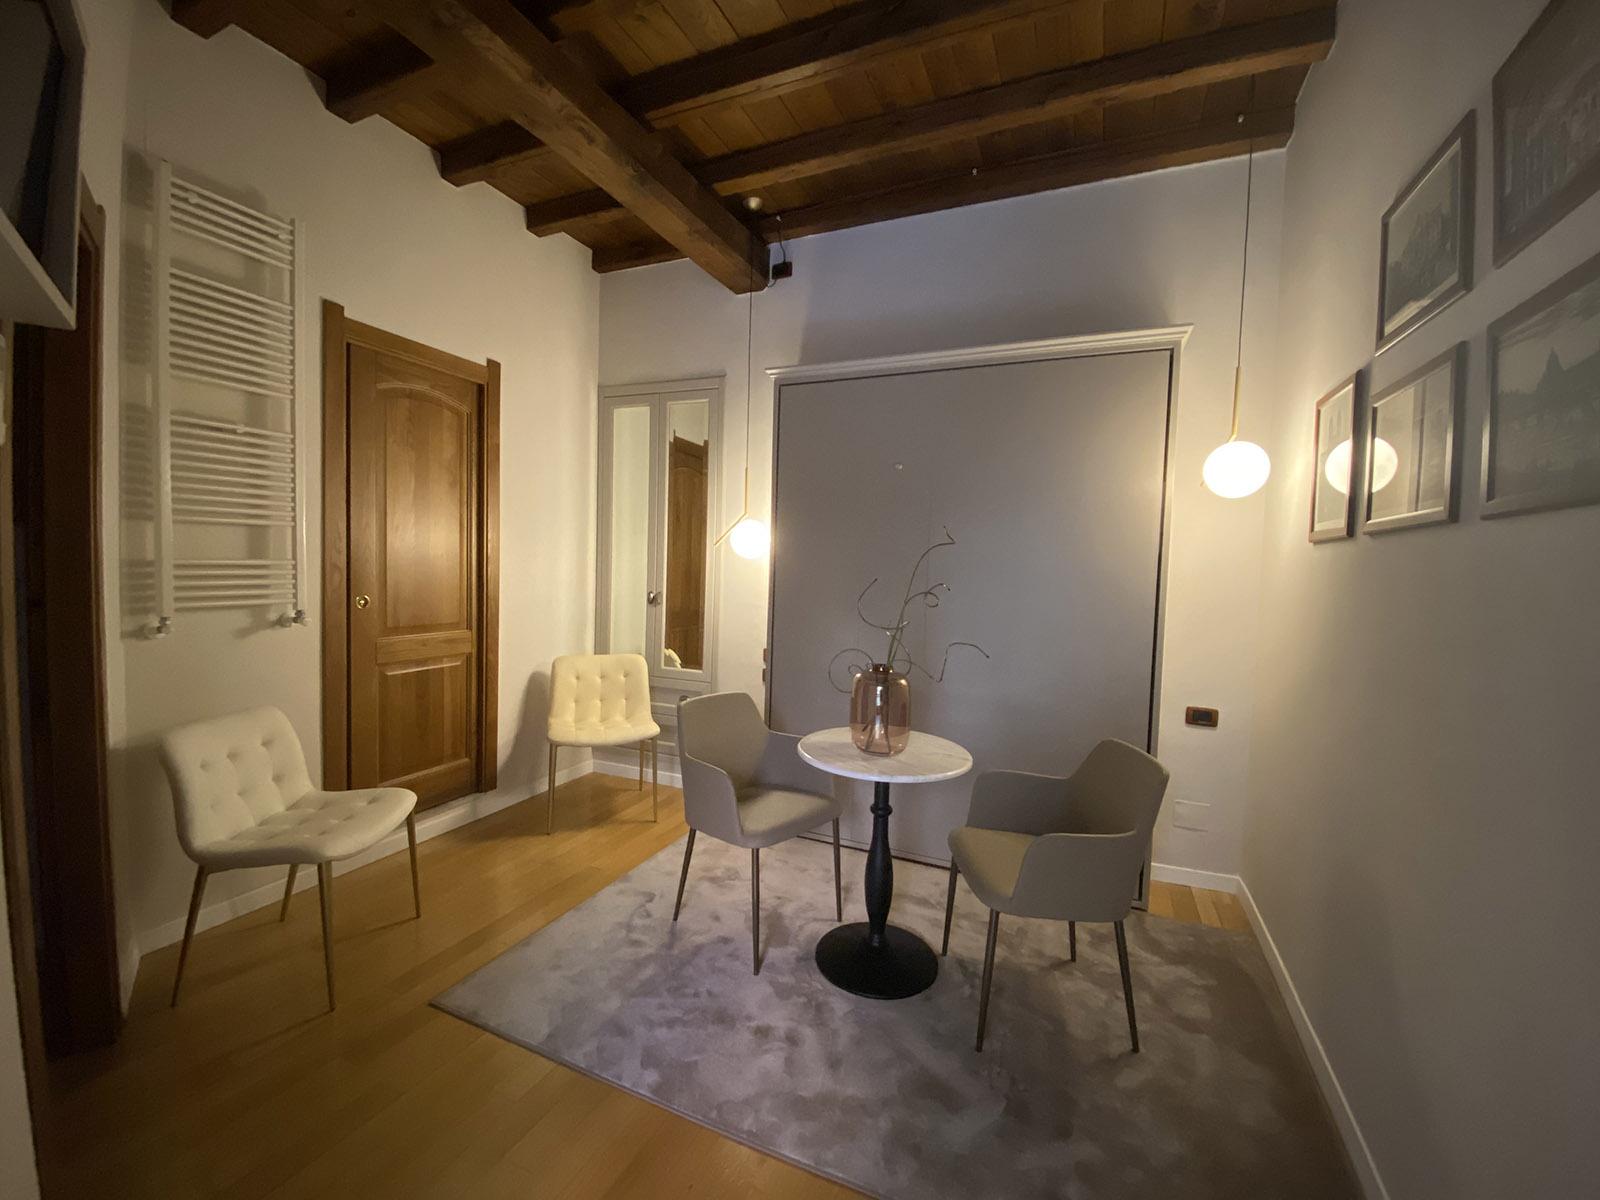 Sala-Relax-Rhona-Rooms-2